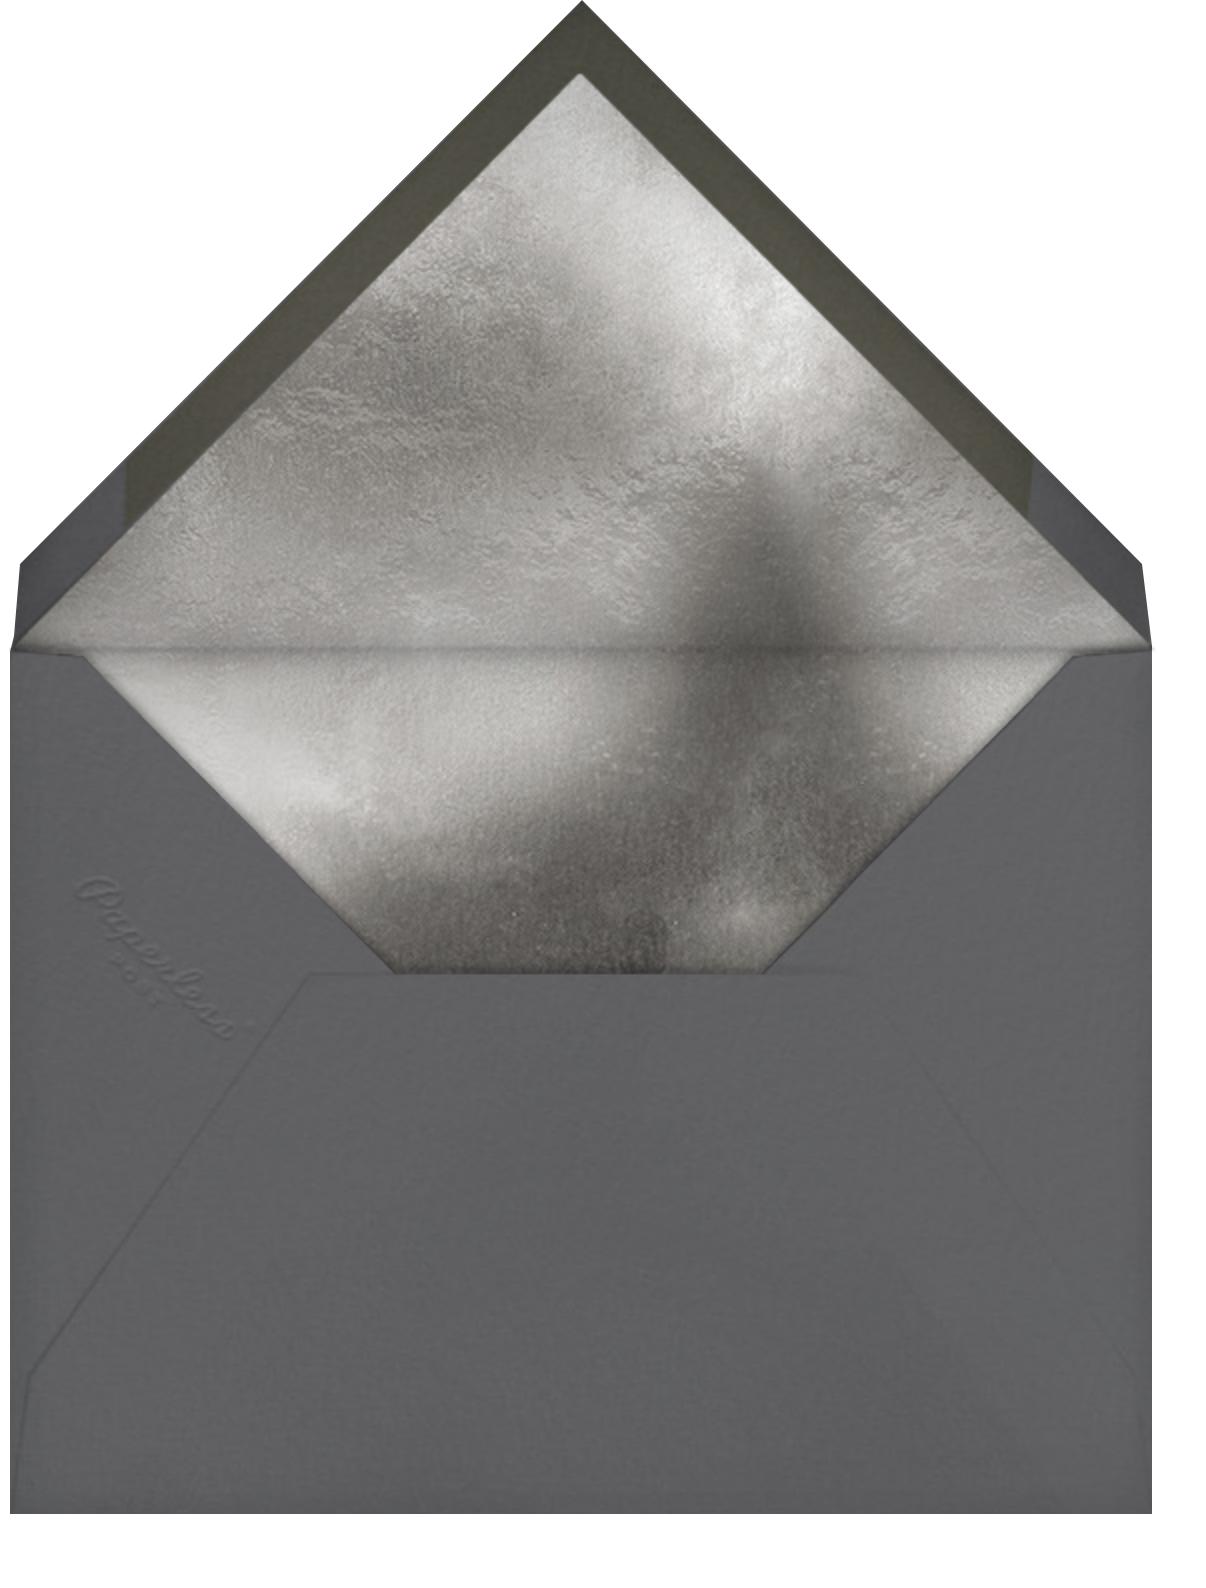 2021 Vision - Douglas - Paperless Post - New Year - envelope back